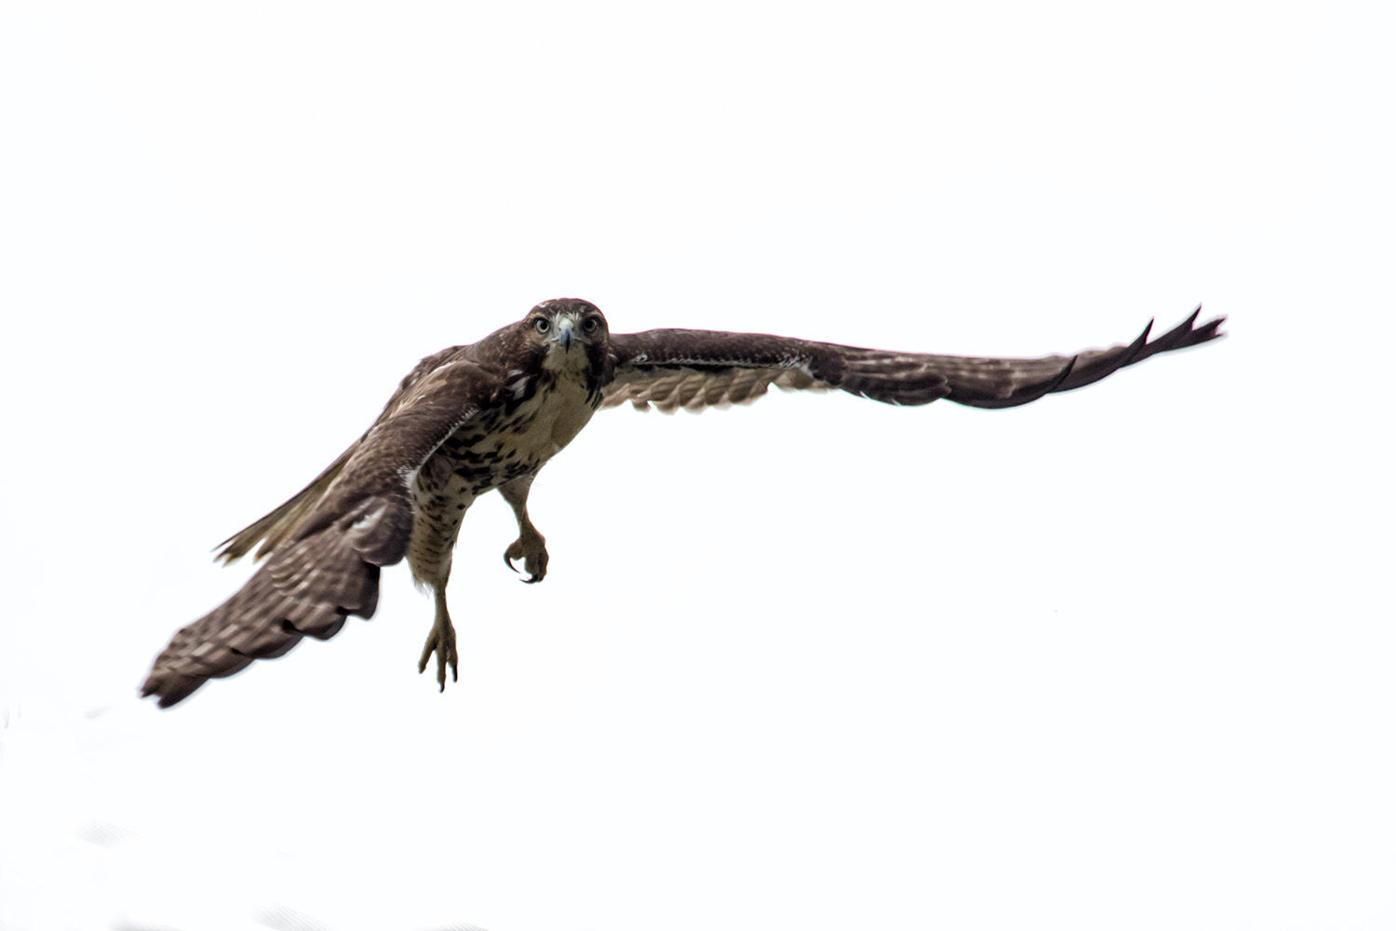 Kettle broad-winged hawks